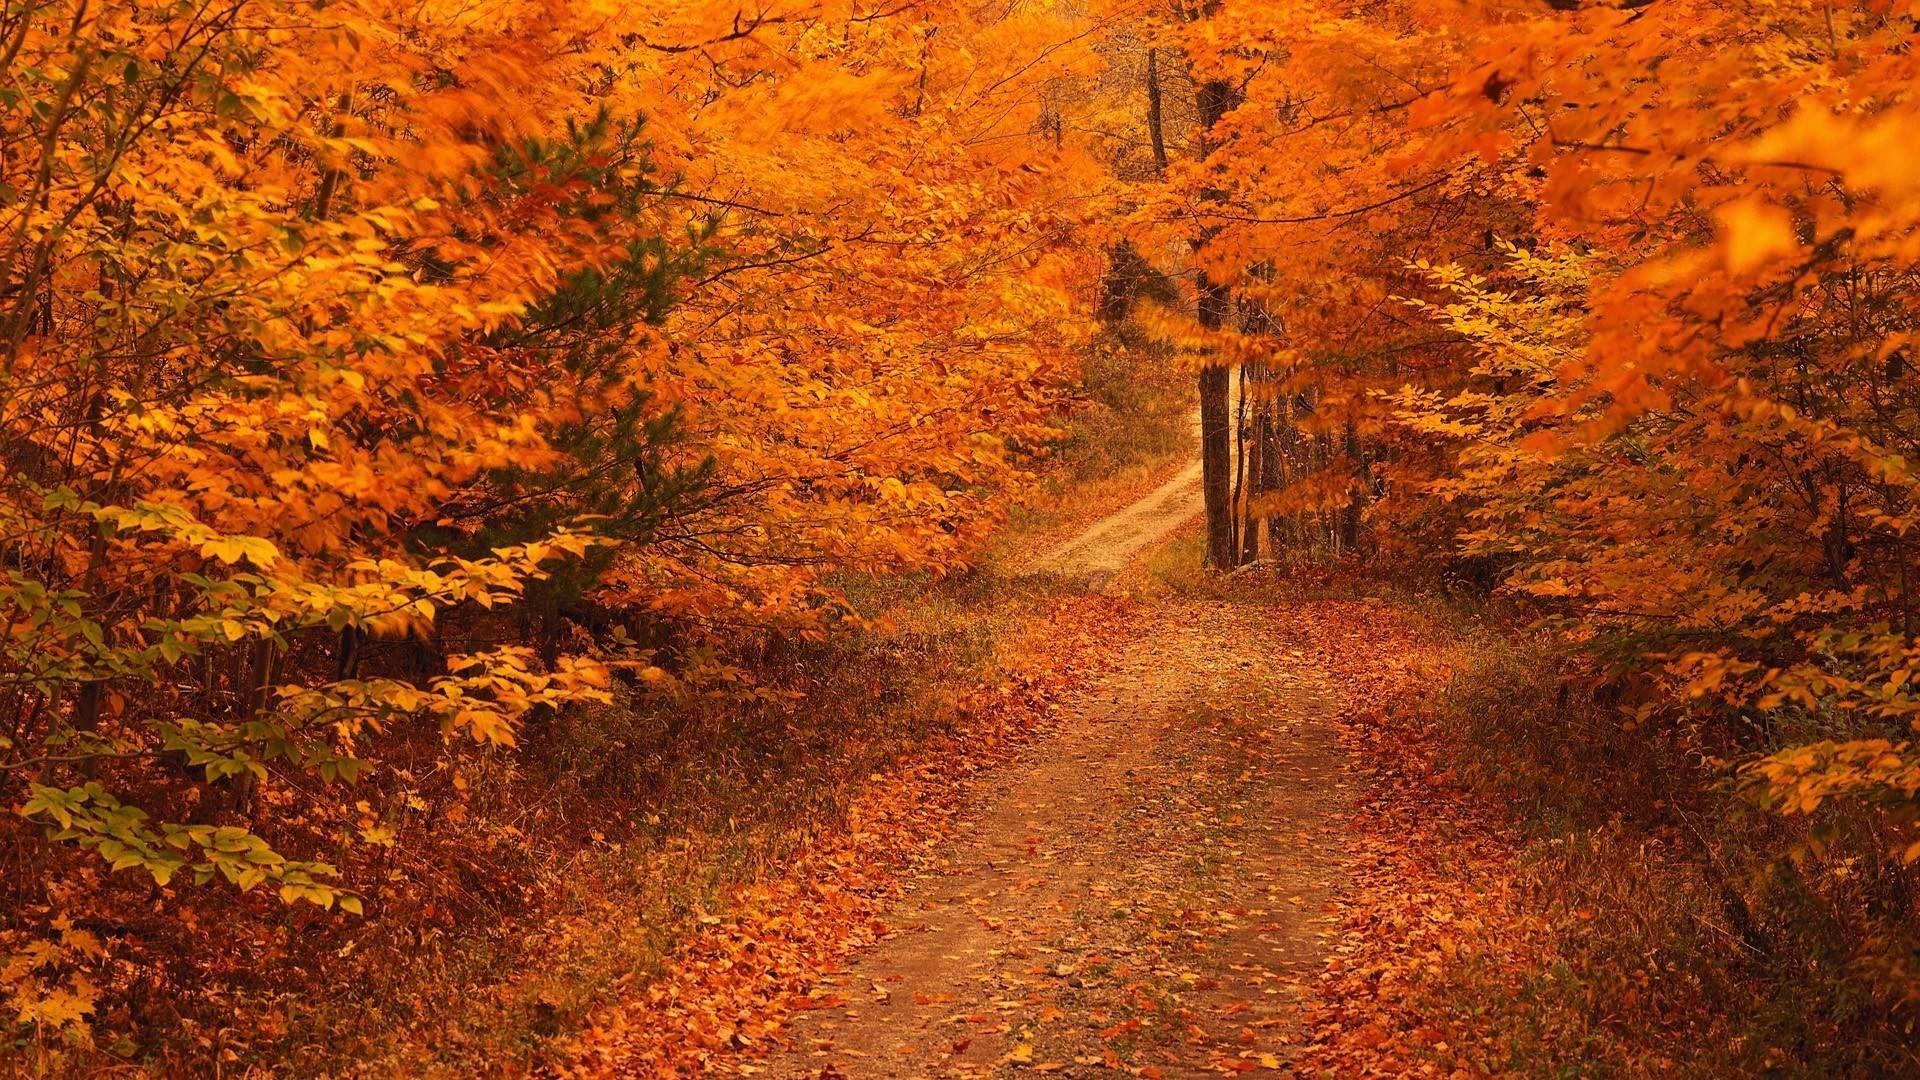 Image: Fall Foliage Wallpaper For Desktop